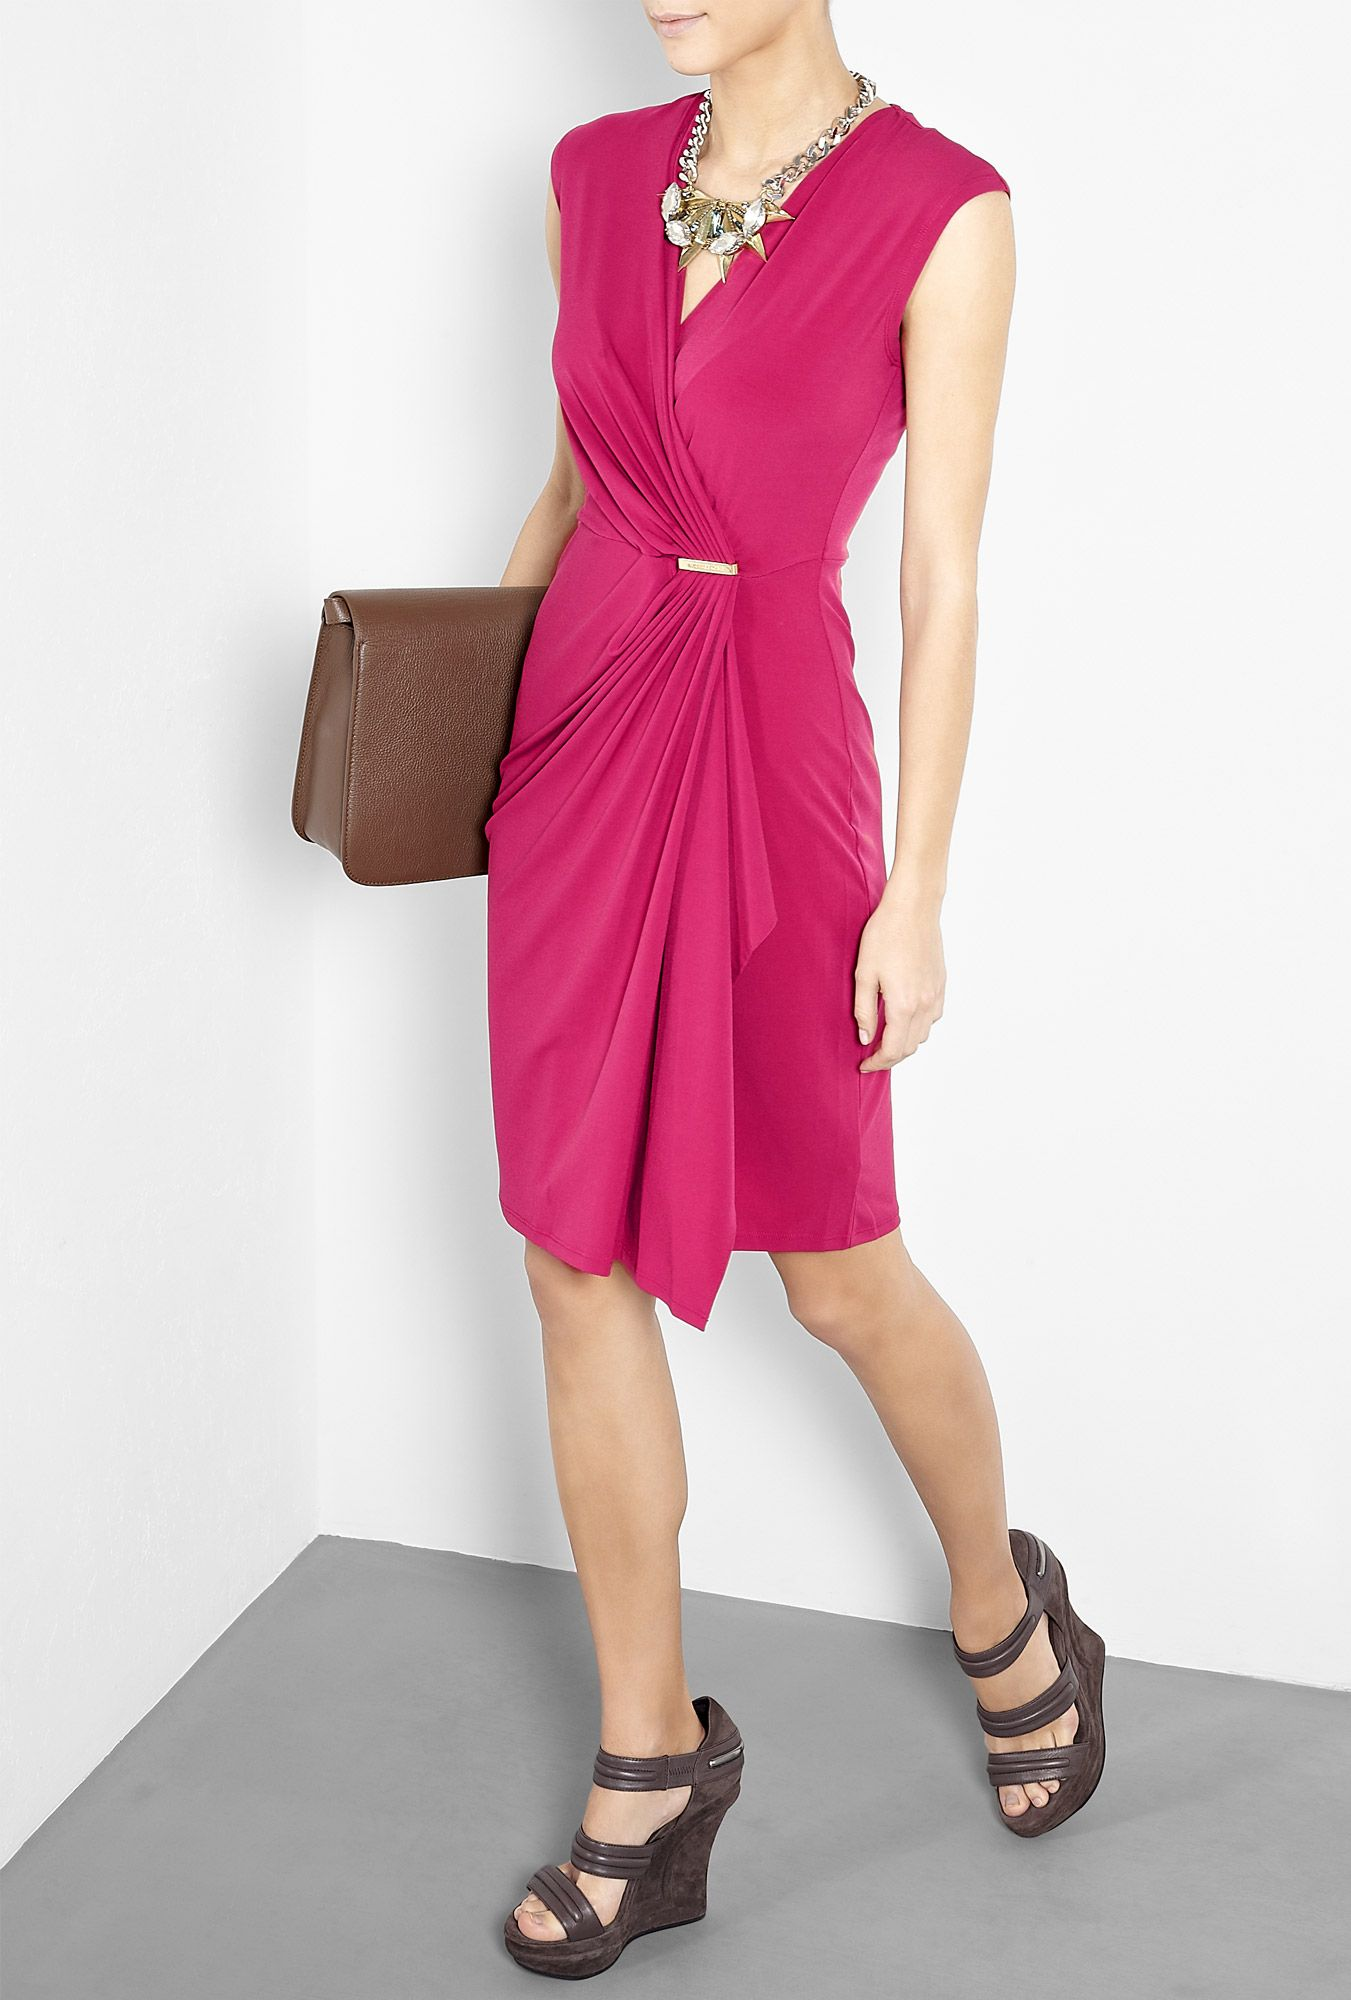 Dress by MICHAEL Michael Kors | Passion 4 fashion | Pinterest | Ropa ...